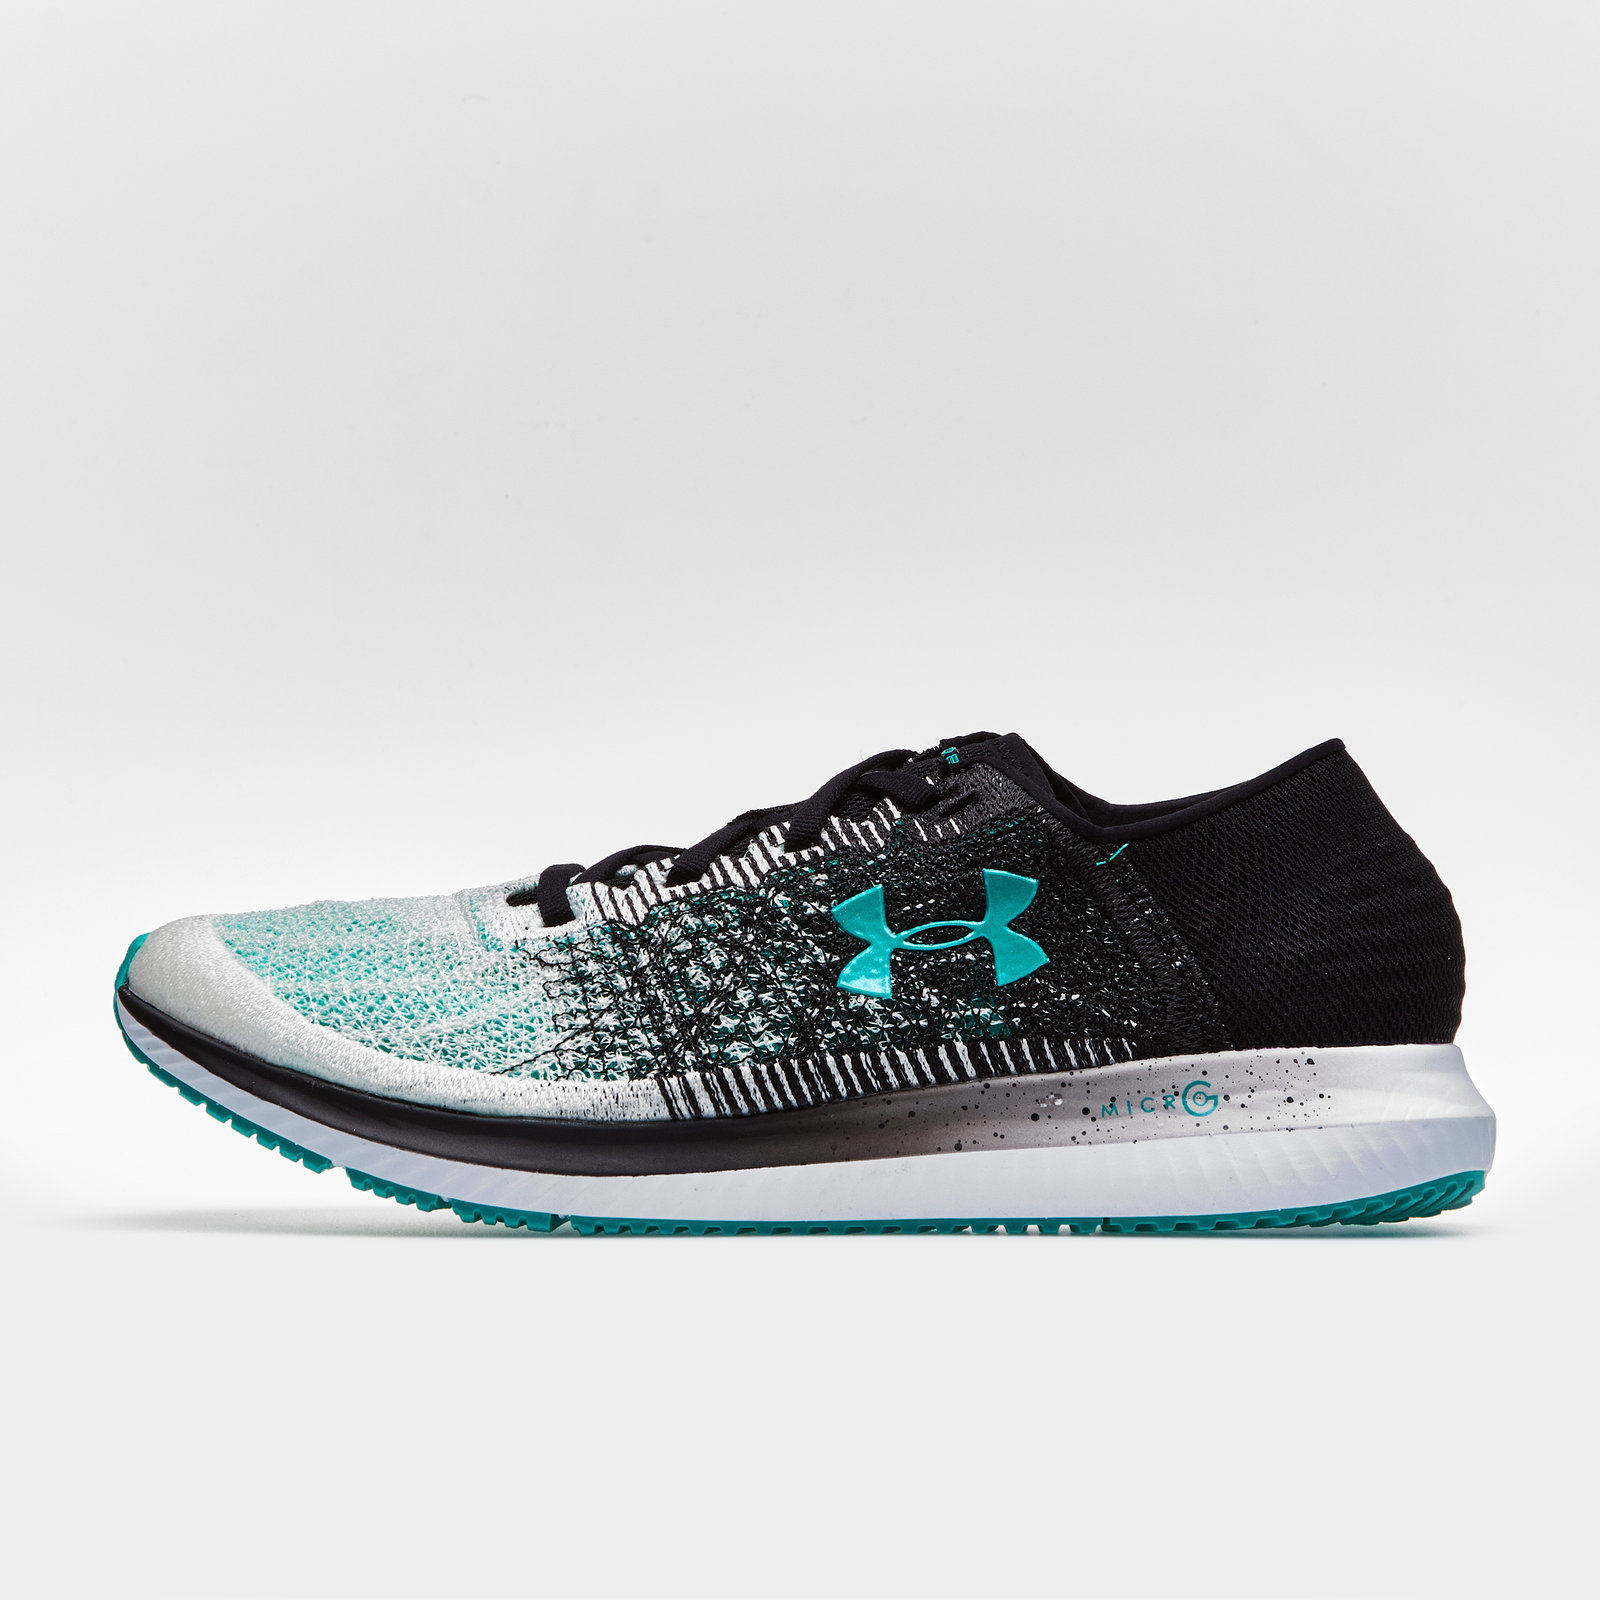 230f87ec3e Details about Under Armour Mens UA Threadborne Blur Running Shoes Footwear  Trainers Black